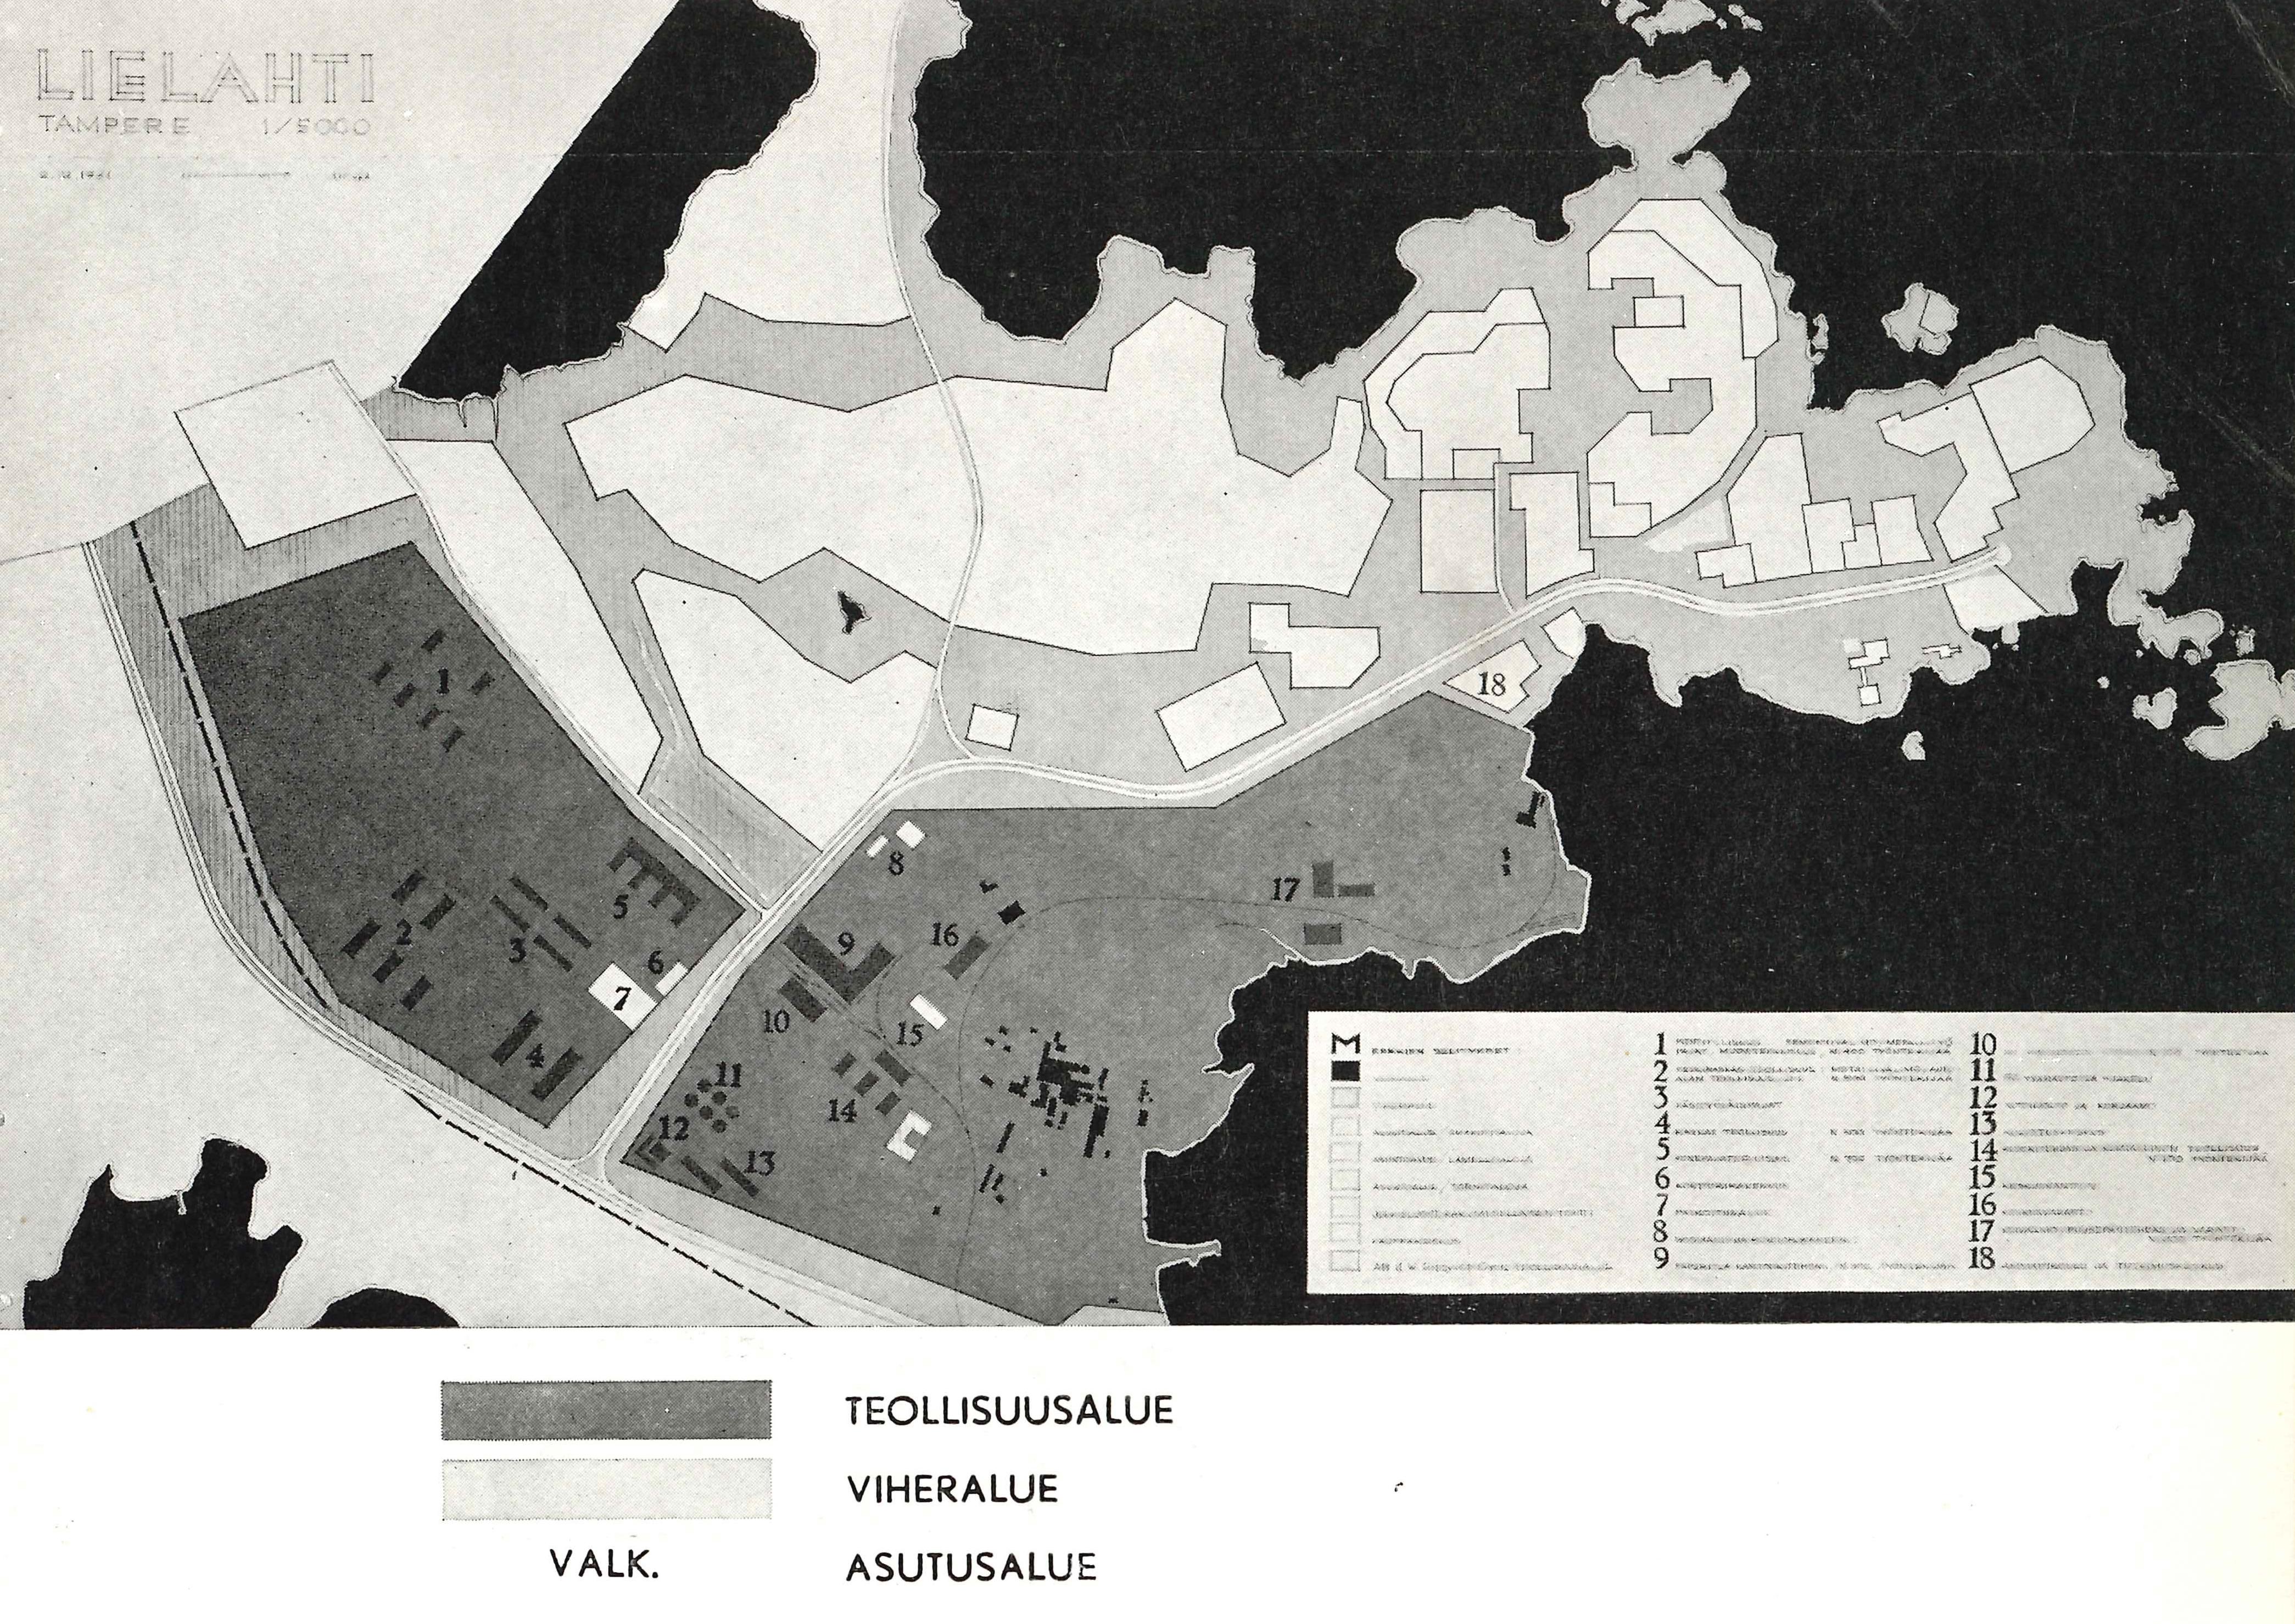 Ab J.W. Enqvist Oy:n vuosikertomus 1961.